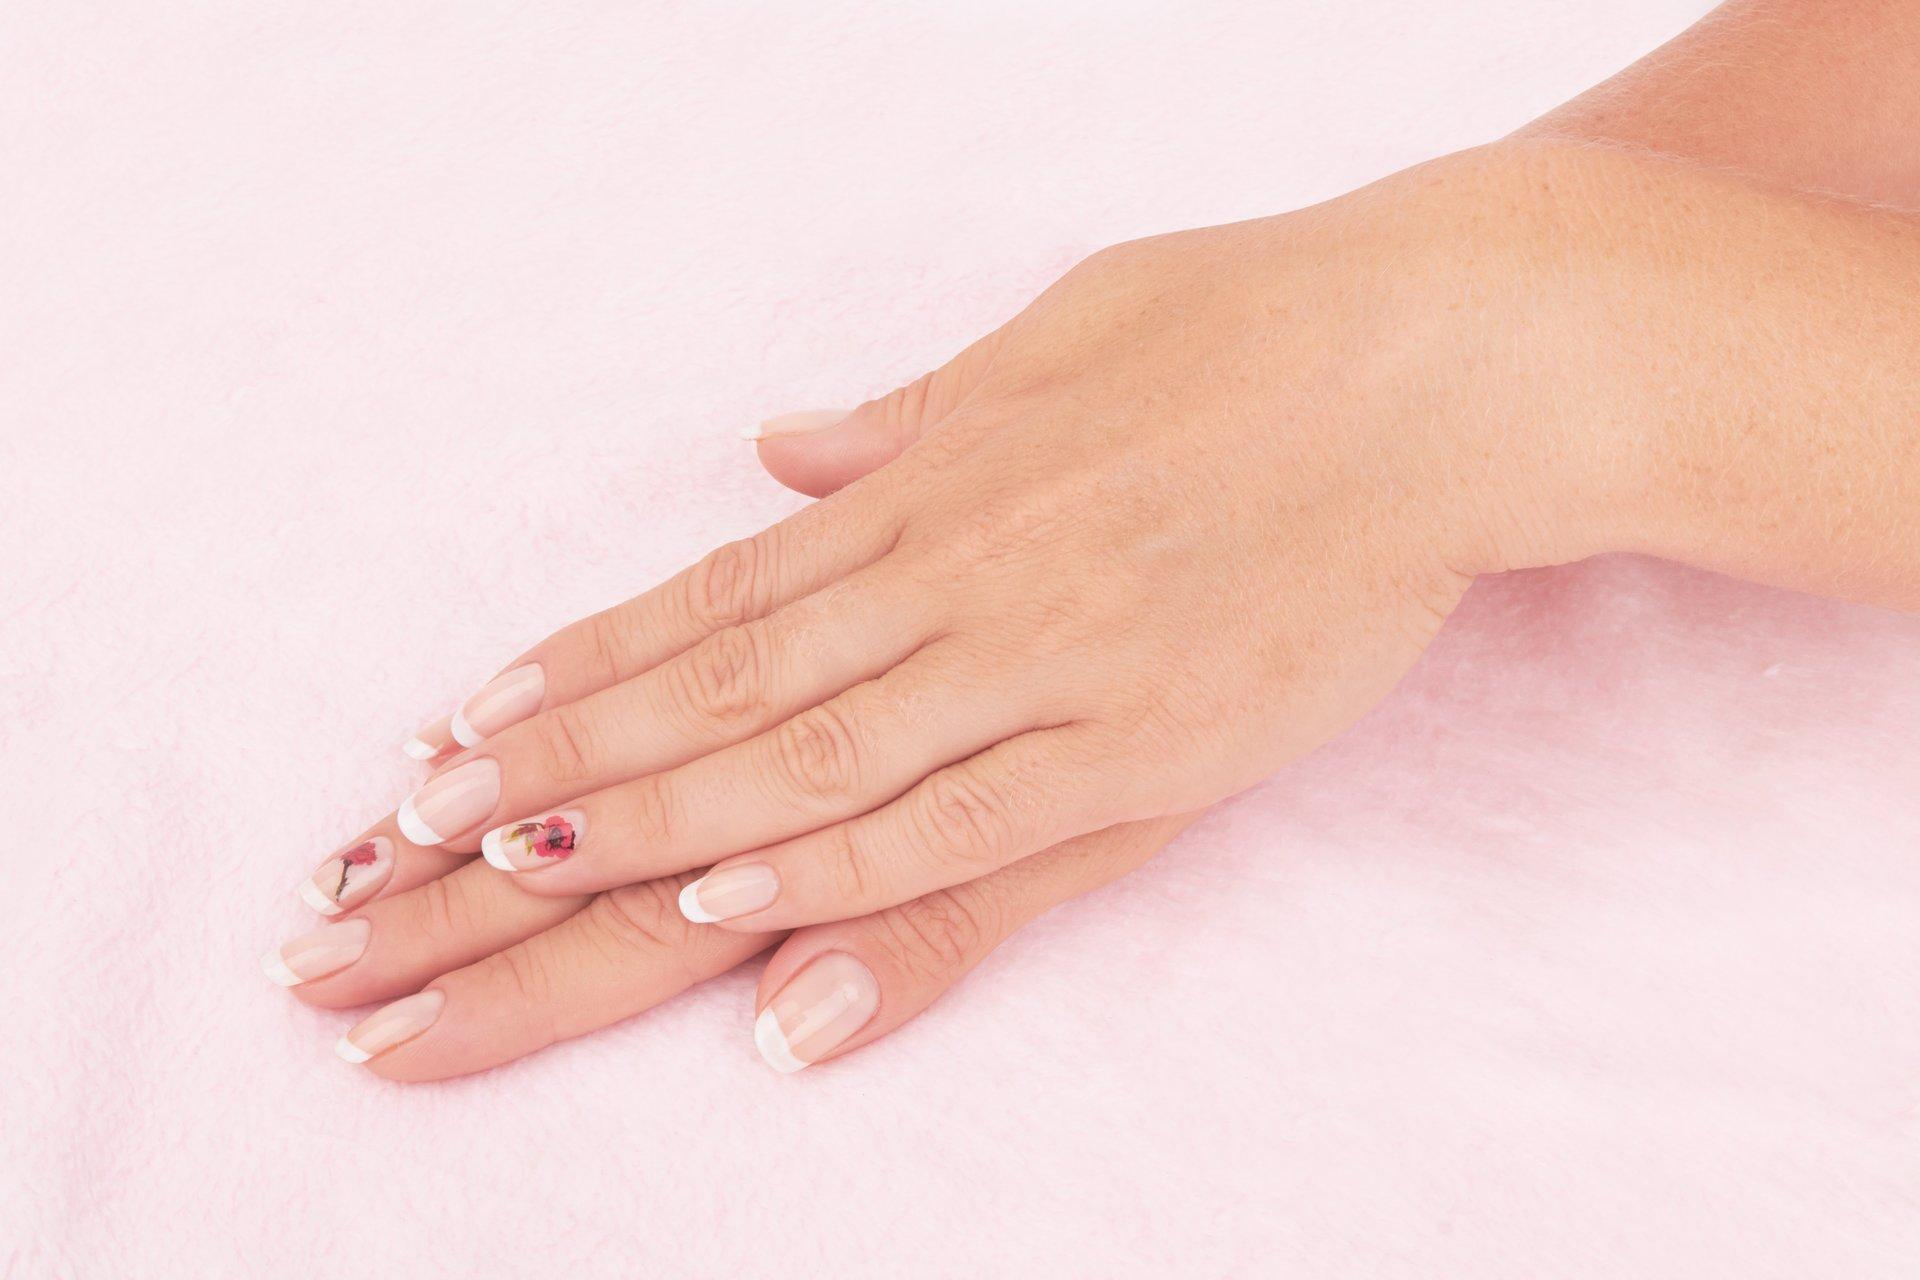 Manicure services at our salon